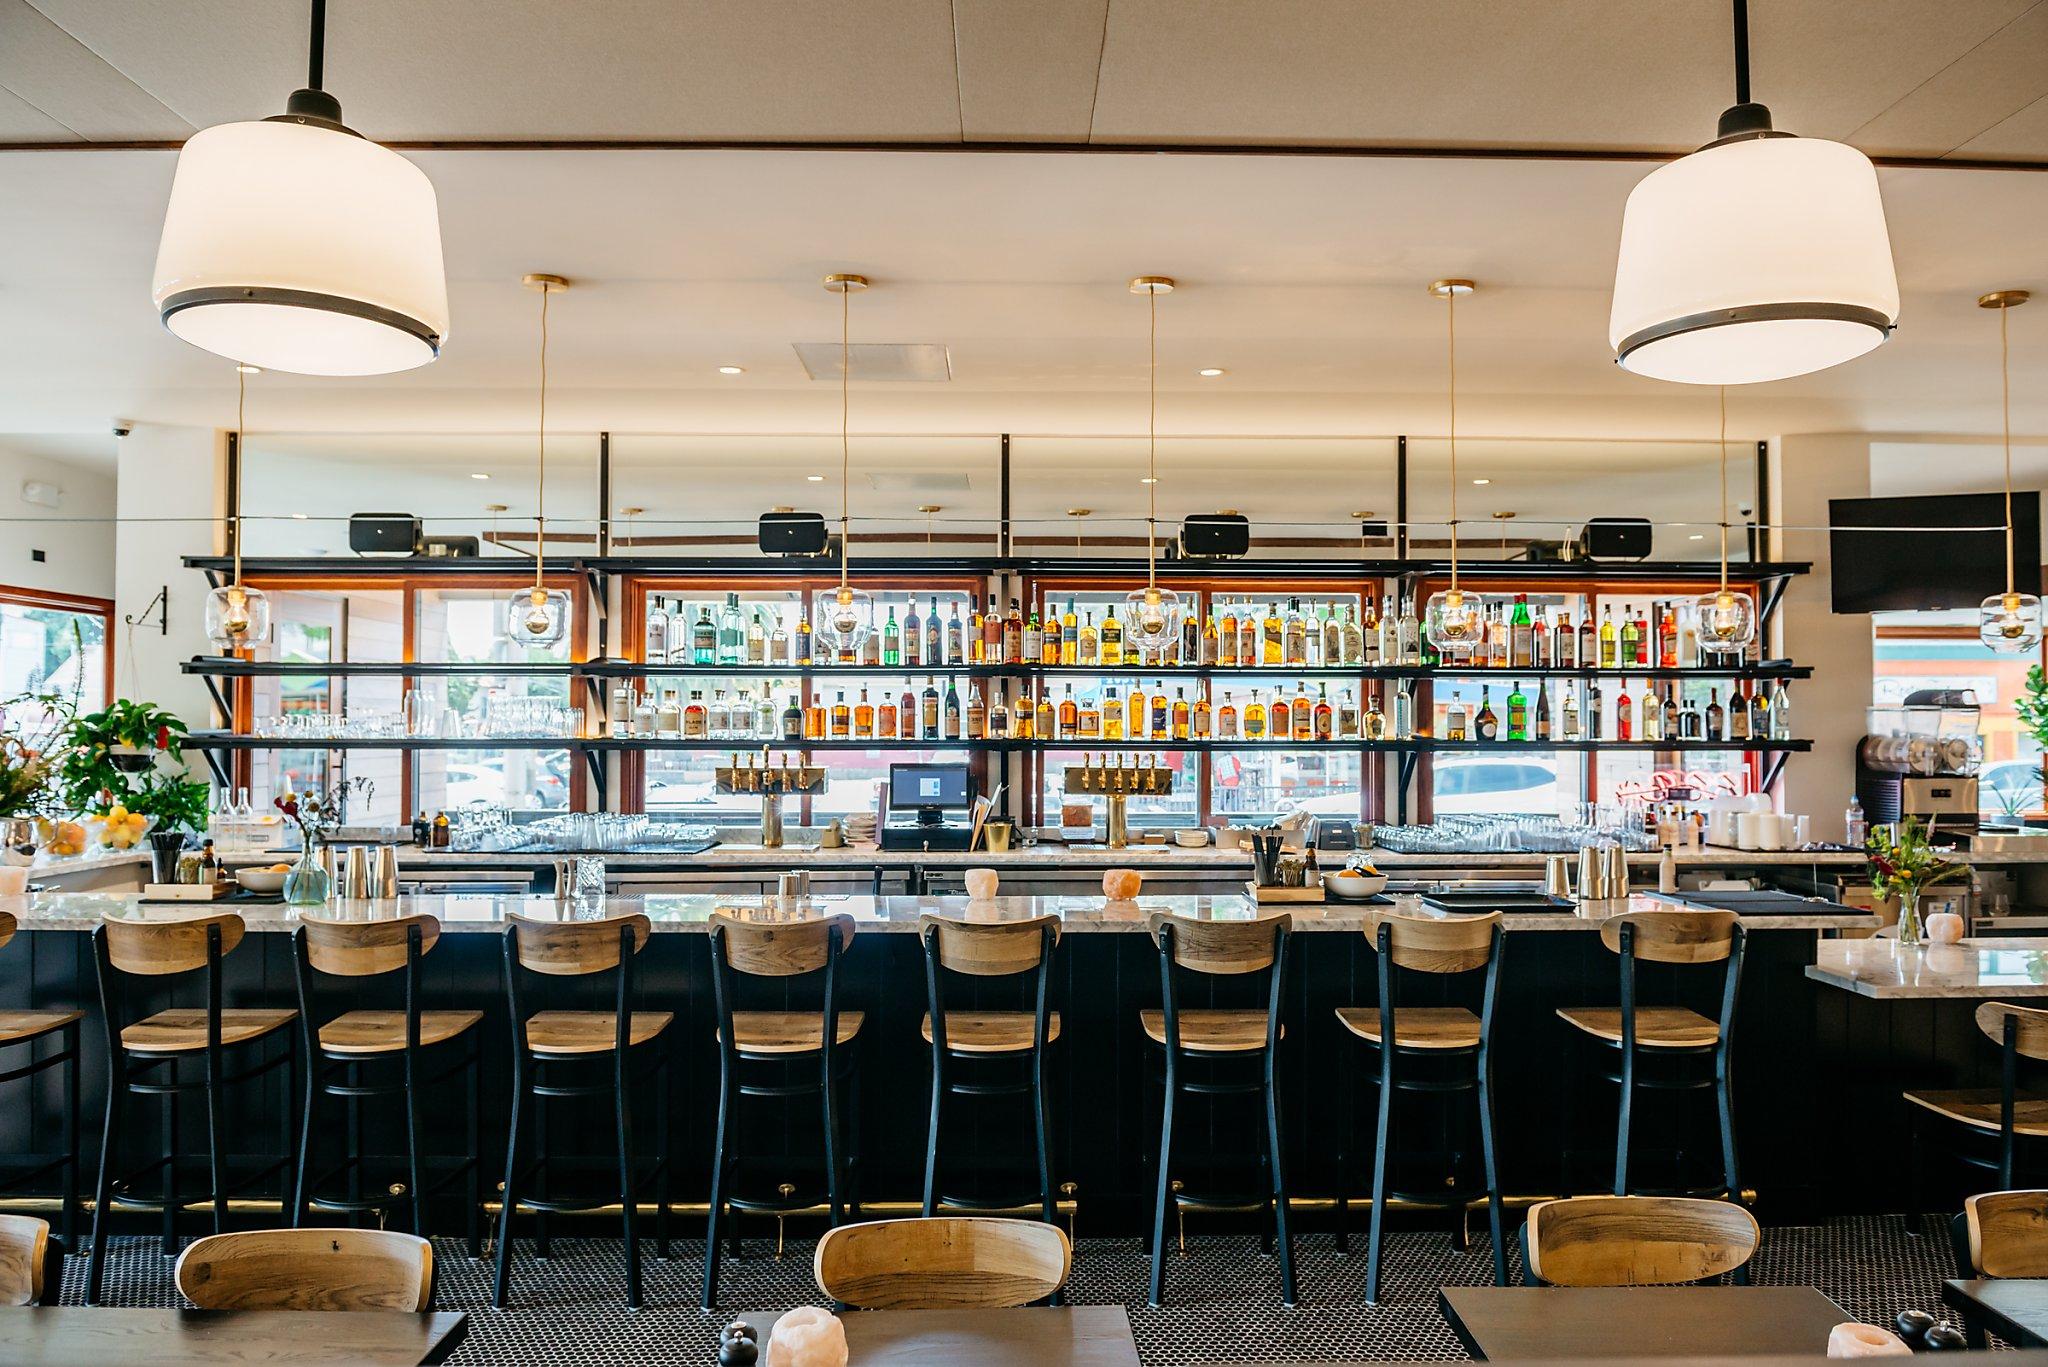 Oakland Brunch Destination Grand Lake Kitchen Opens Ambitious Second Restaurant